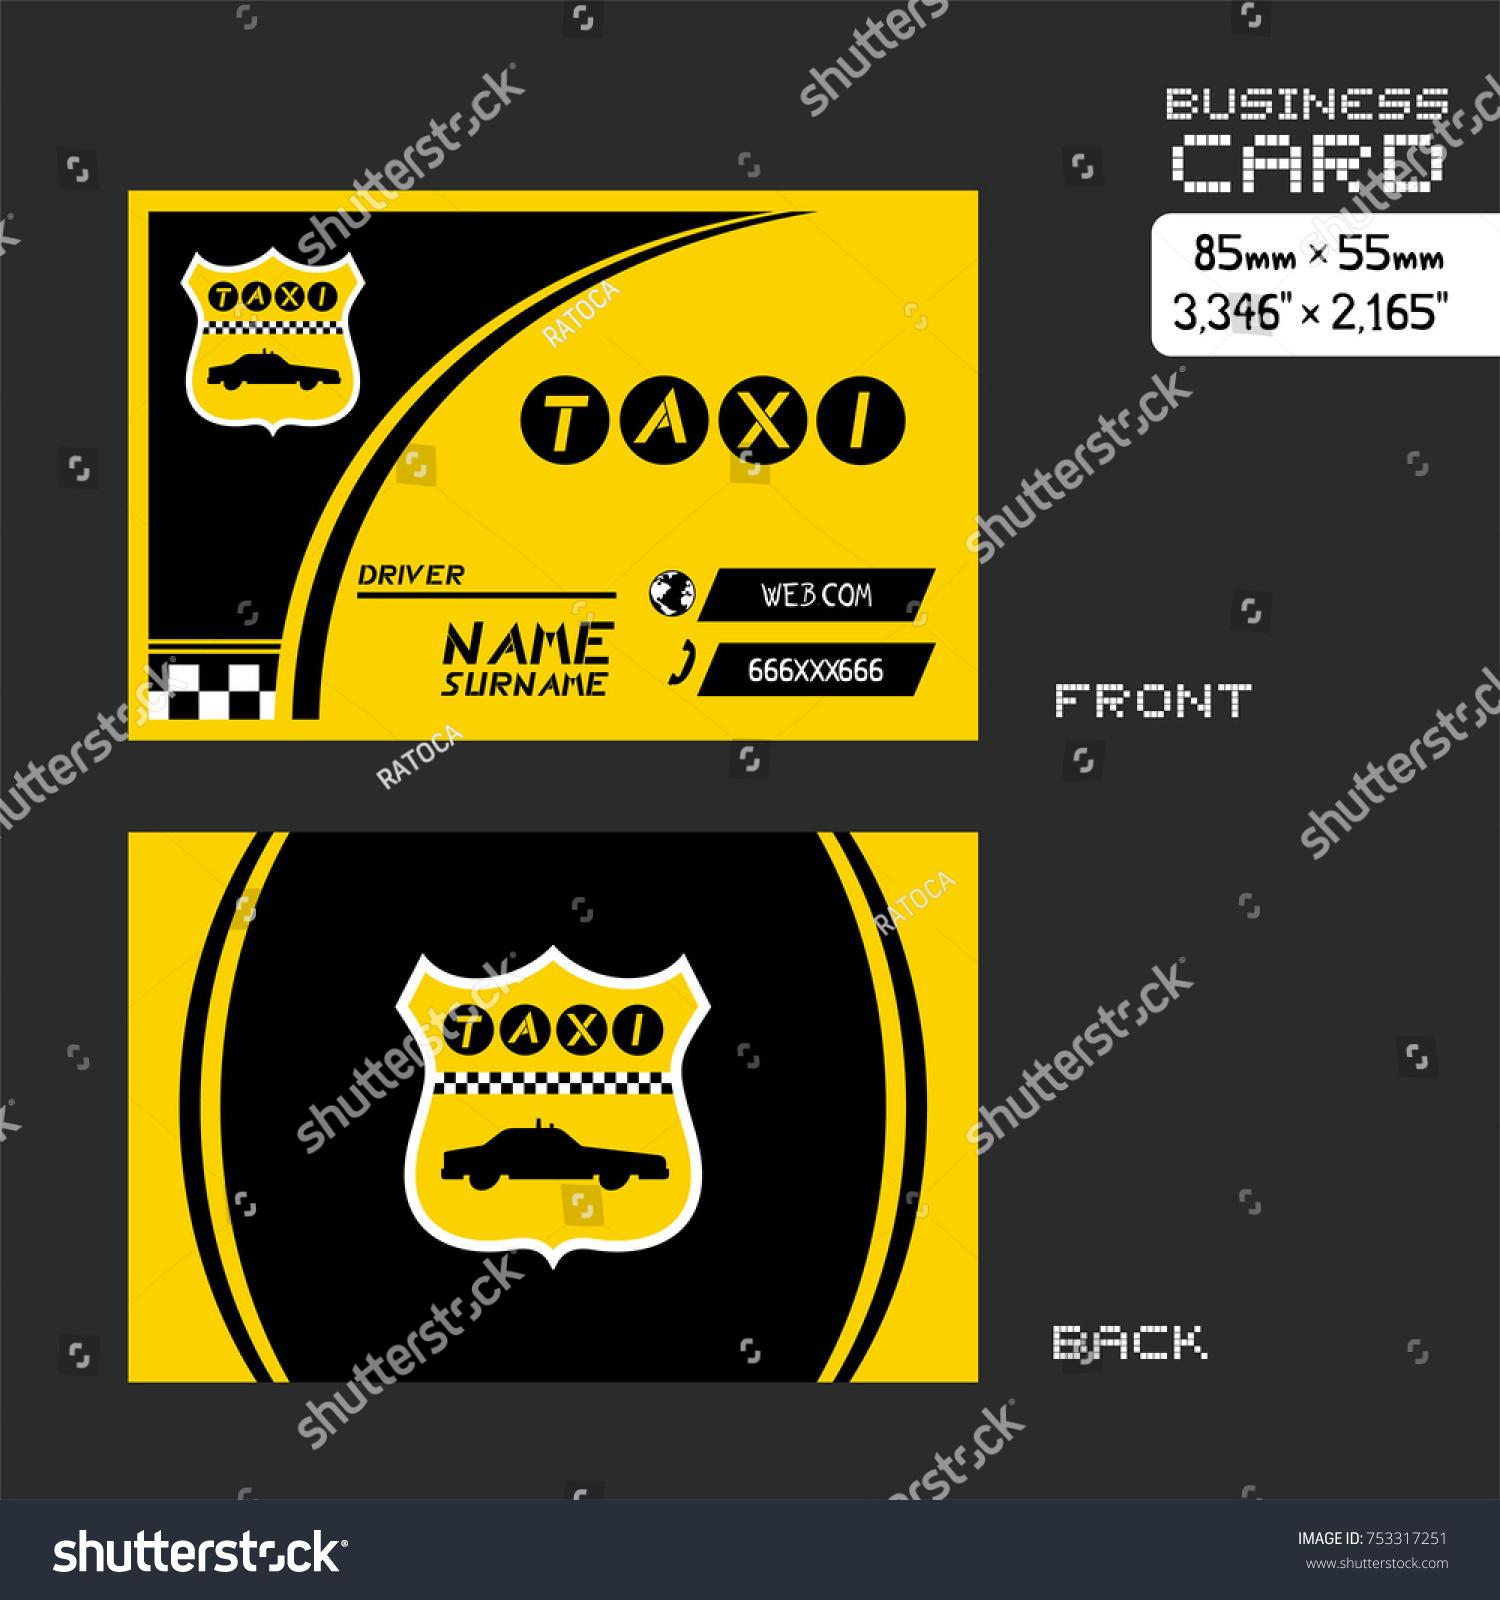 Taxi Business Card Stock Vector 753317251 - Shutterstock